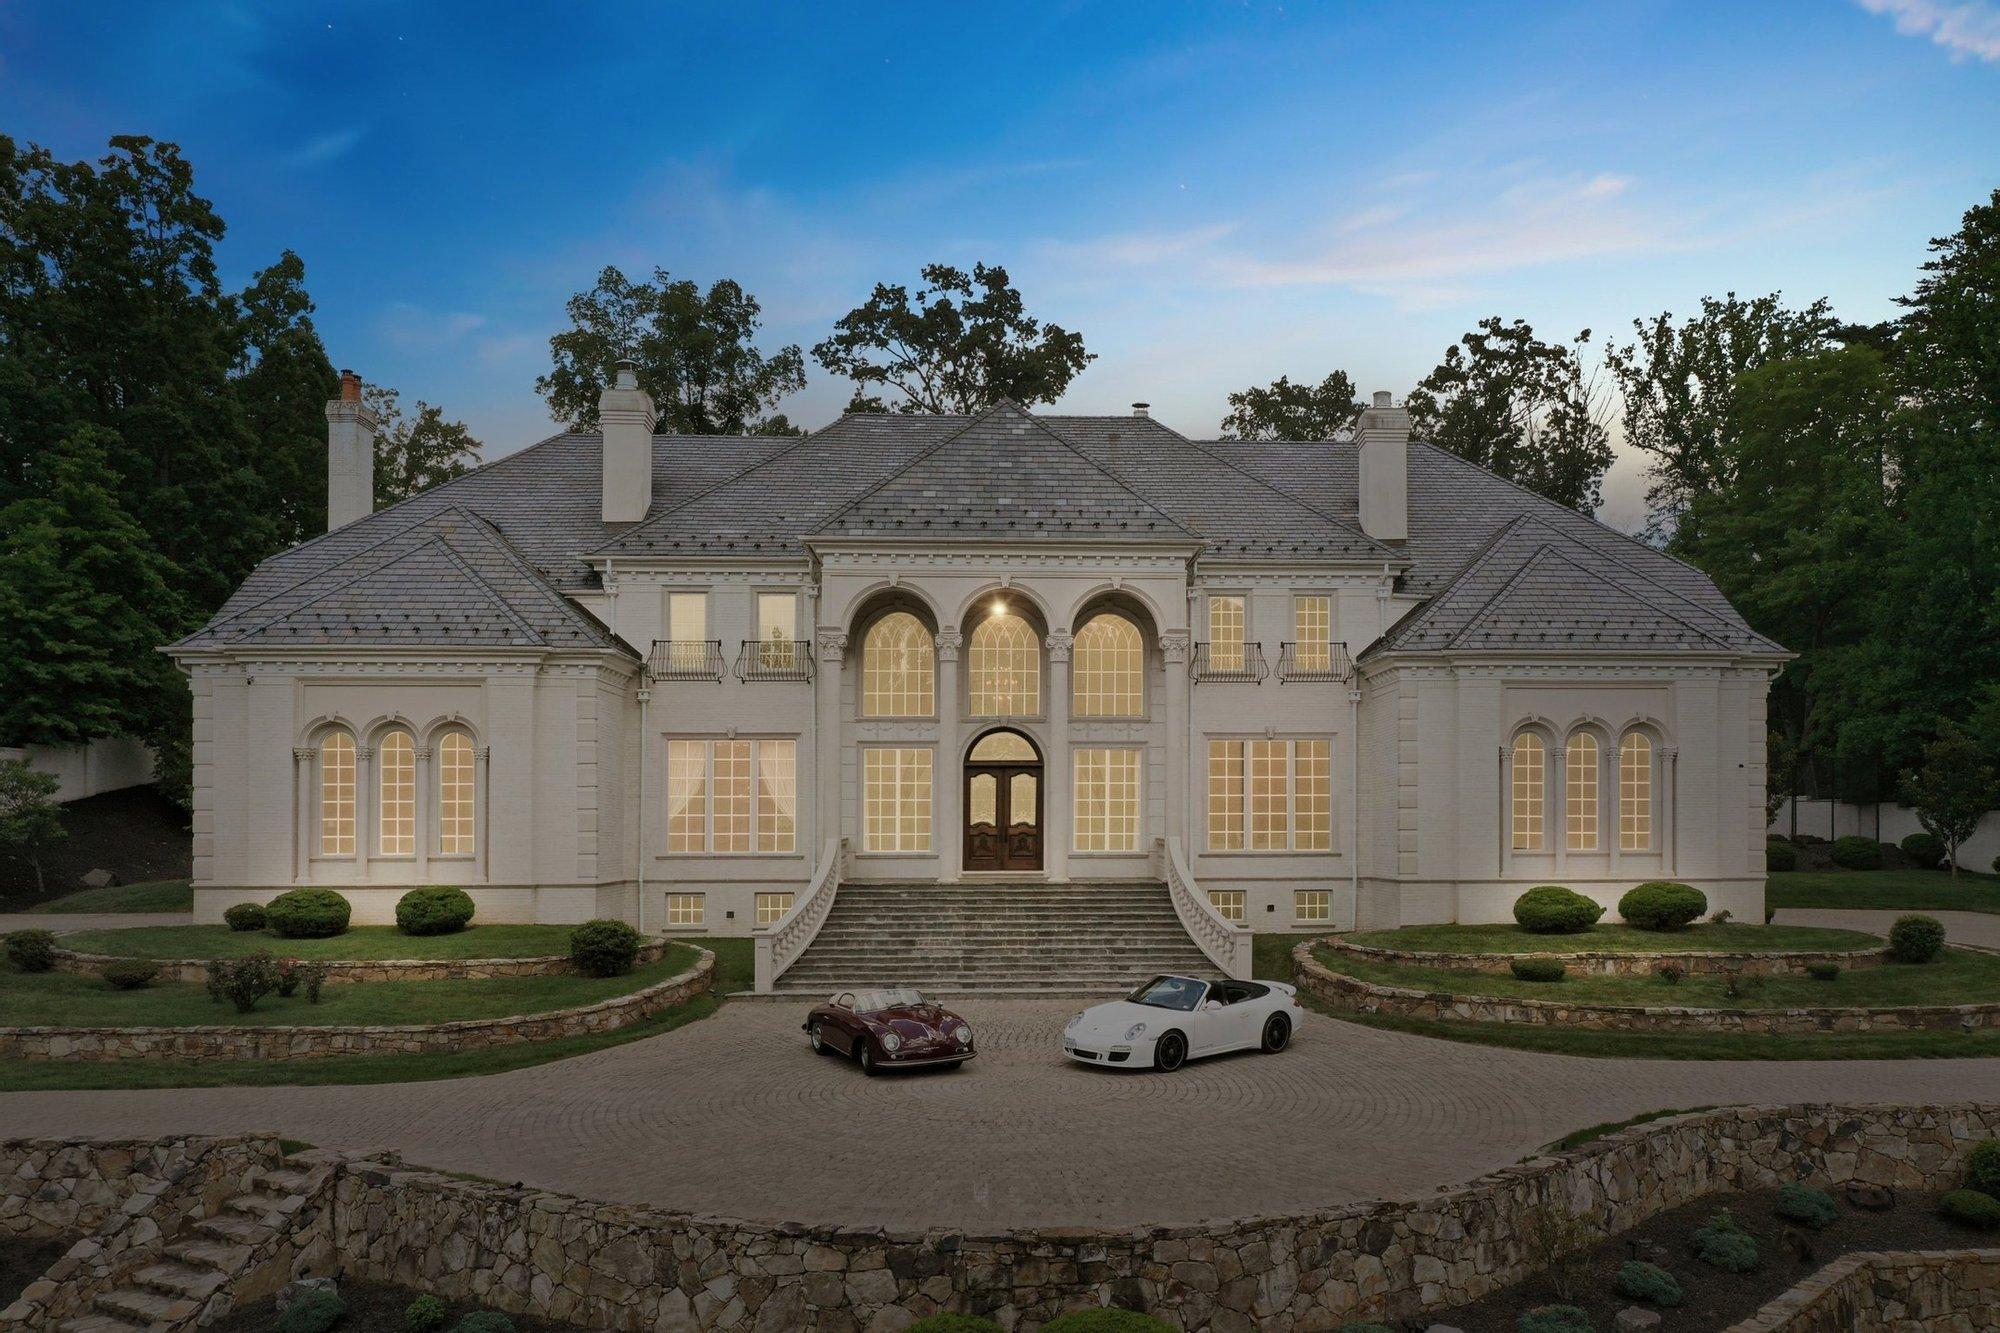 House in Oakton, Virginia, United States 1